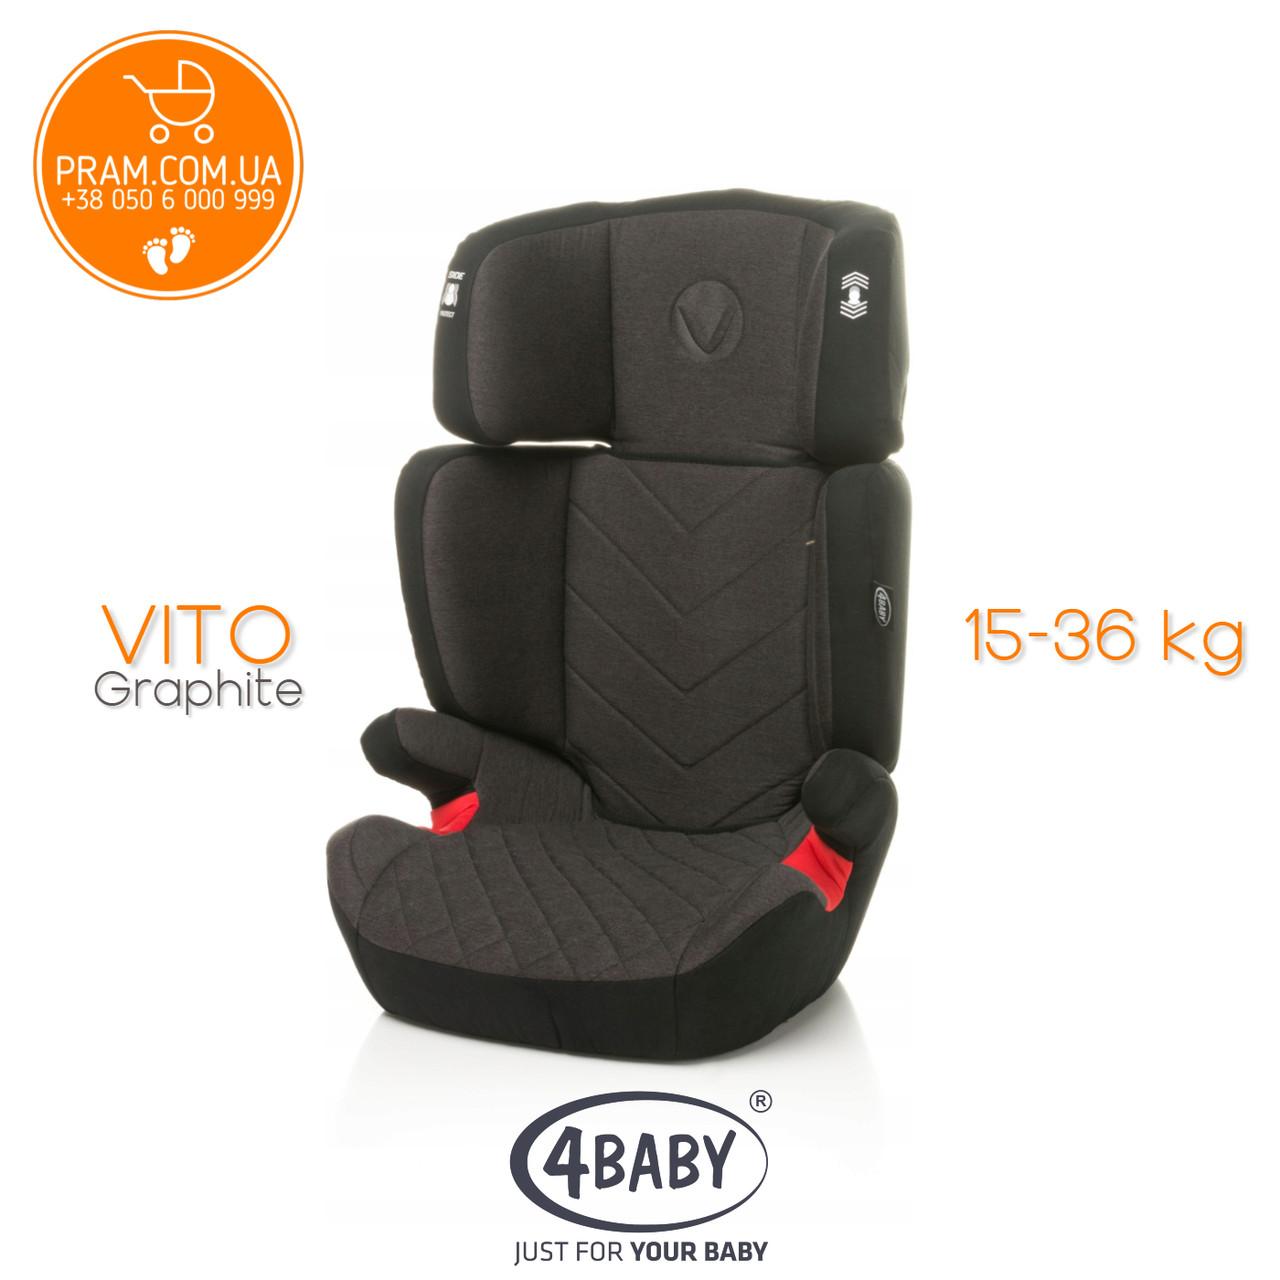 4BABY VITO 2020 автокресло группы 2-3 (15-36 кг) Graphite Темно-серый